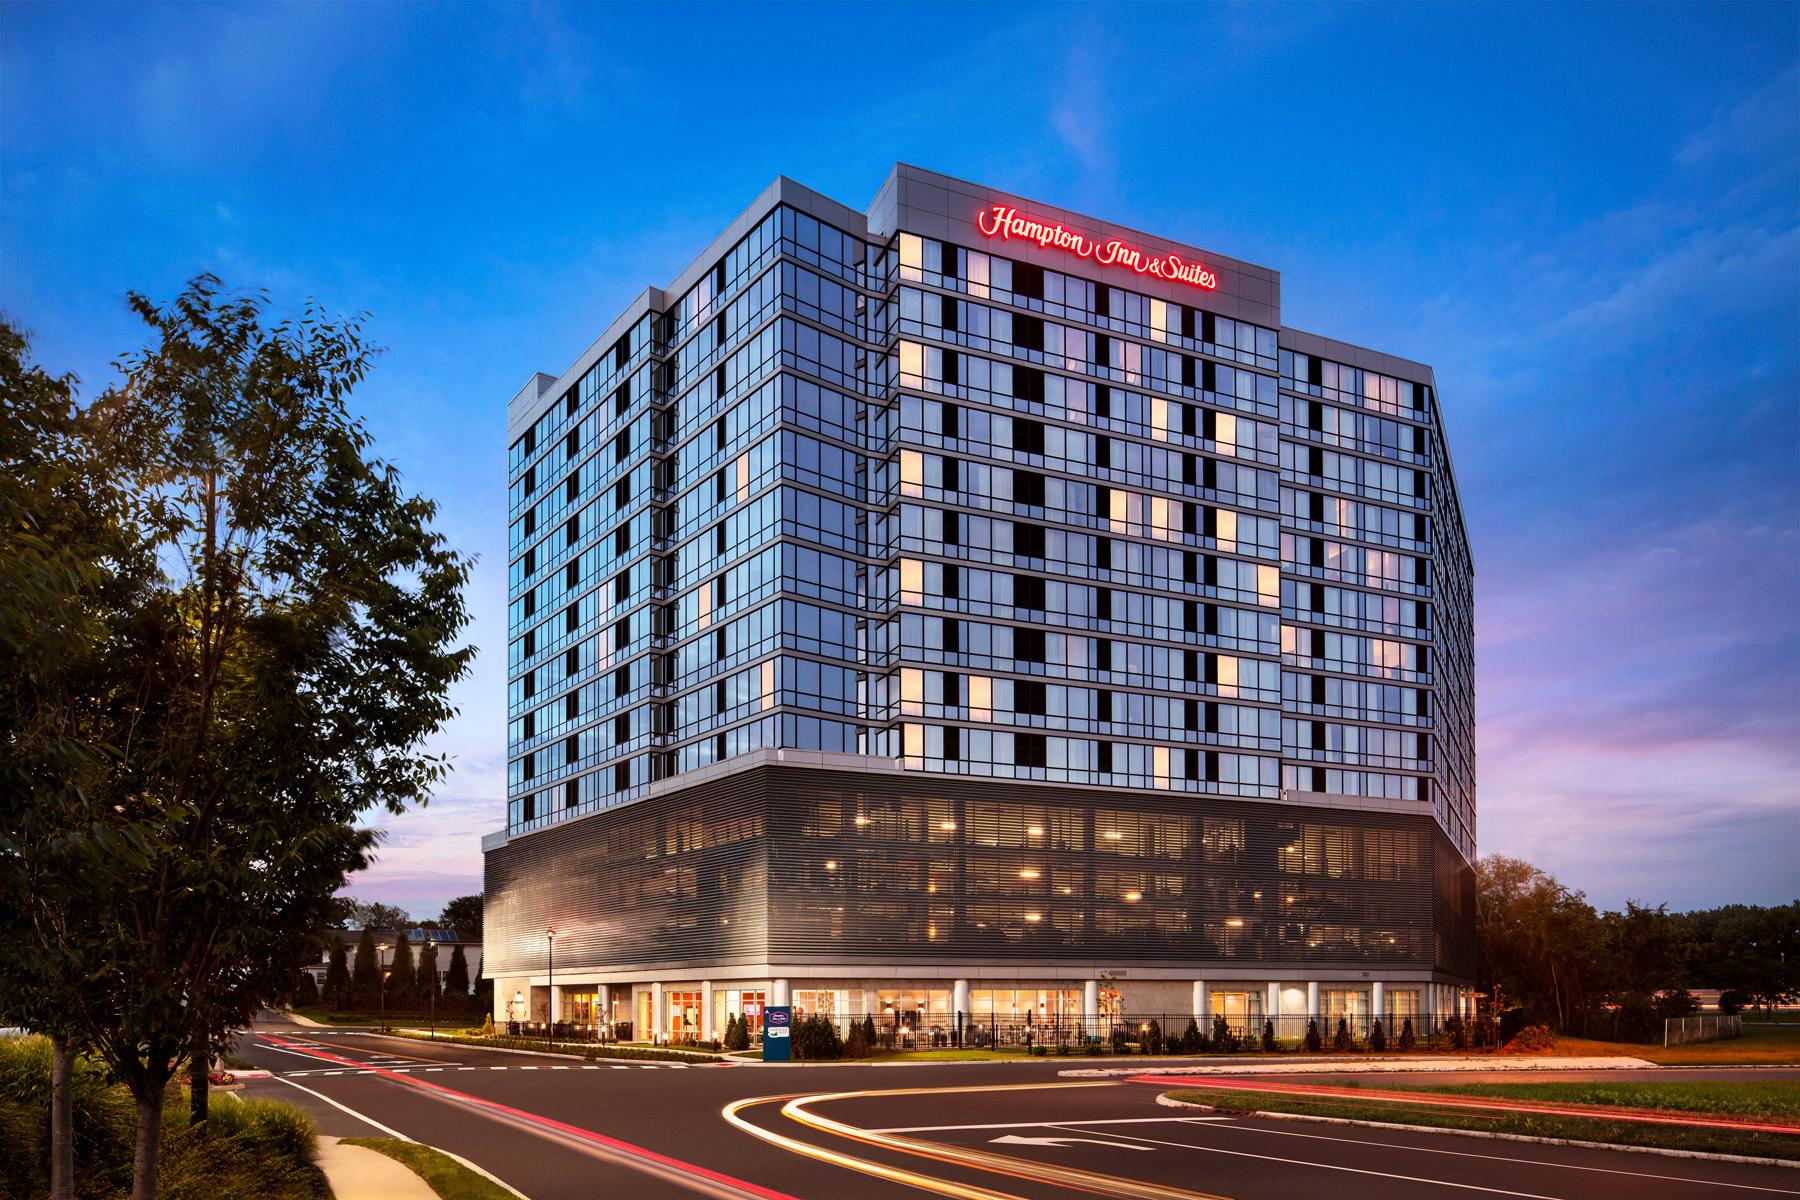 Hampton / Hilton Hotel - Teaneck, NJ